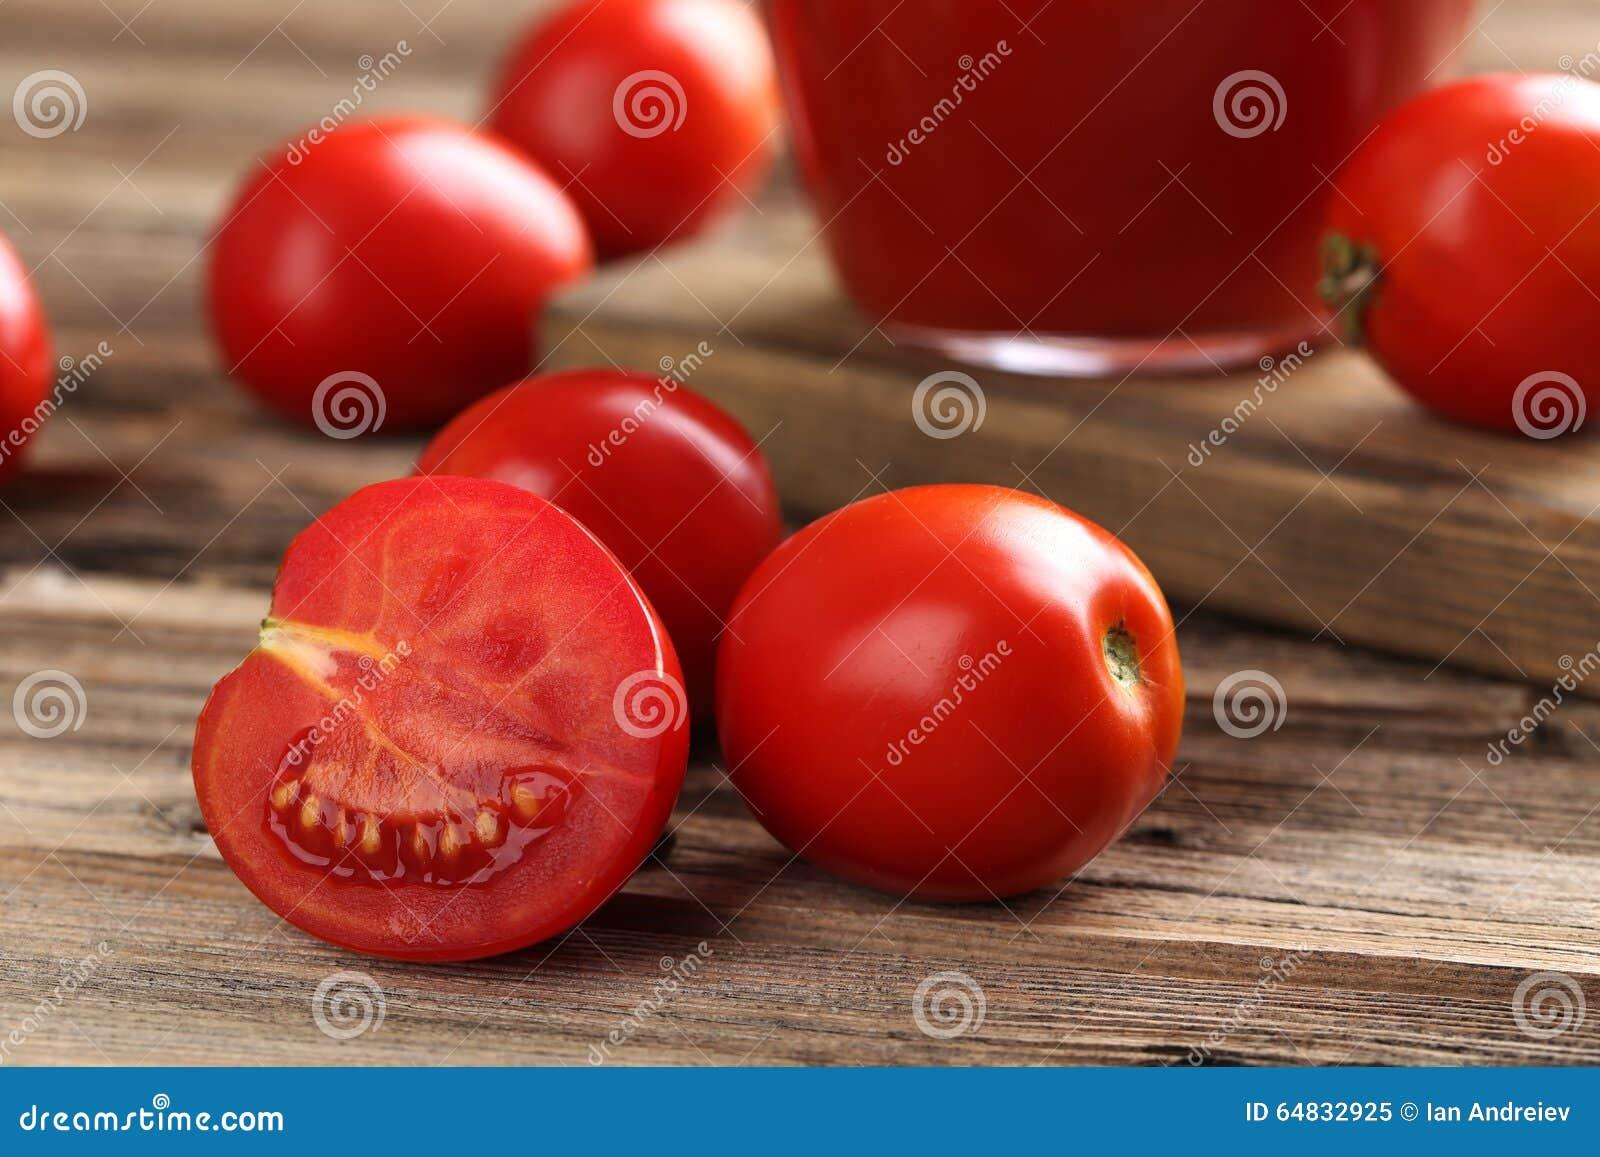 Fresh Red Tomatoes Stock Photo - Image: 64832925